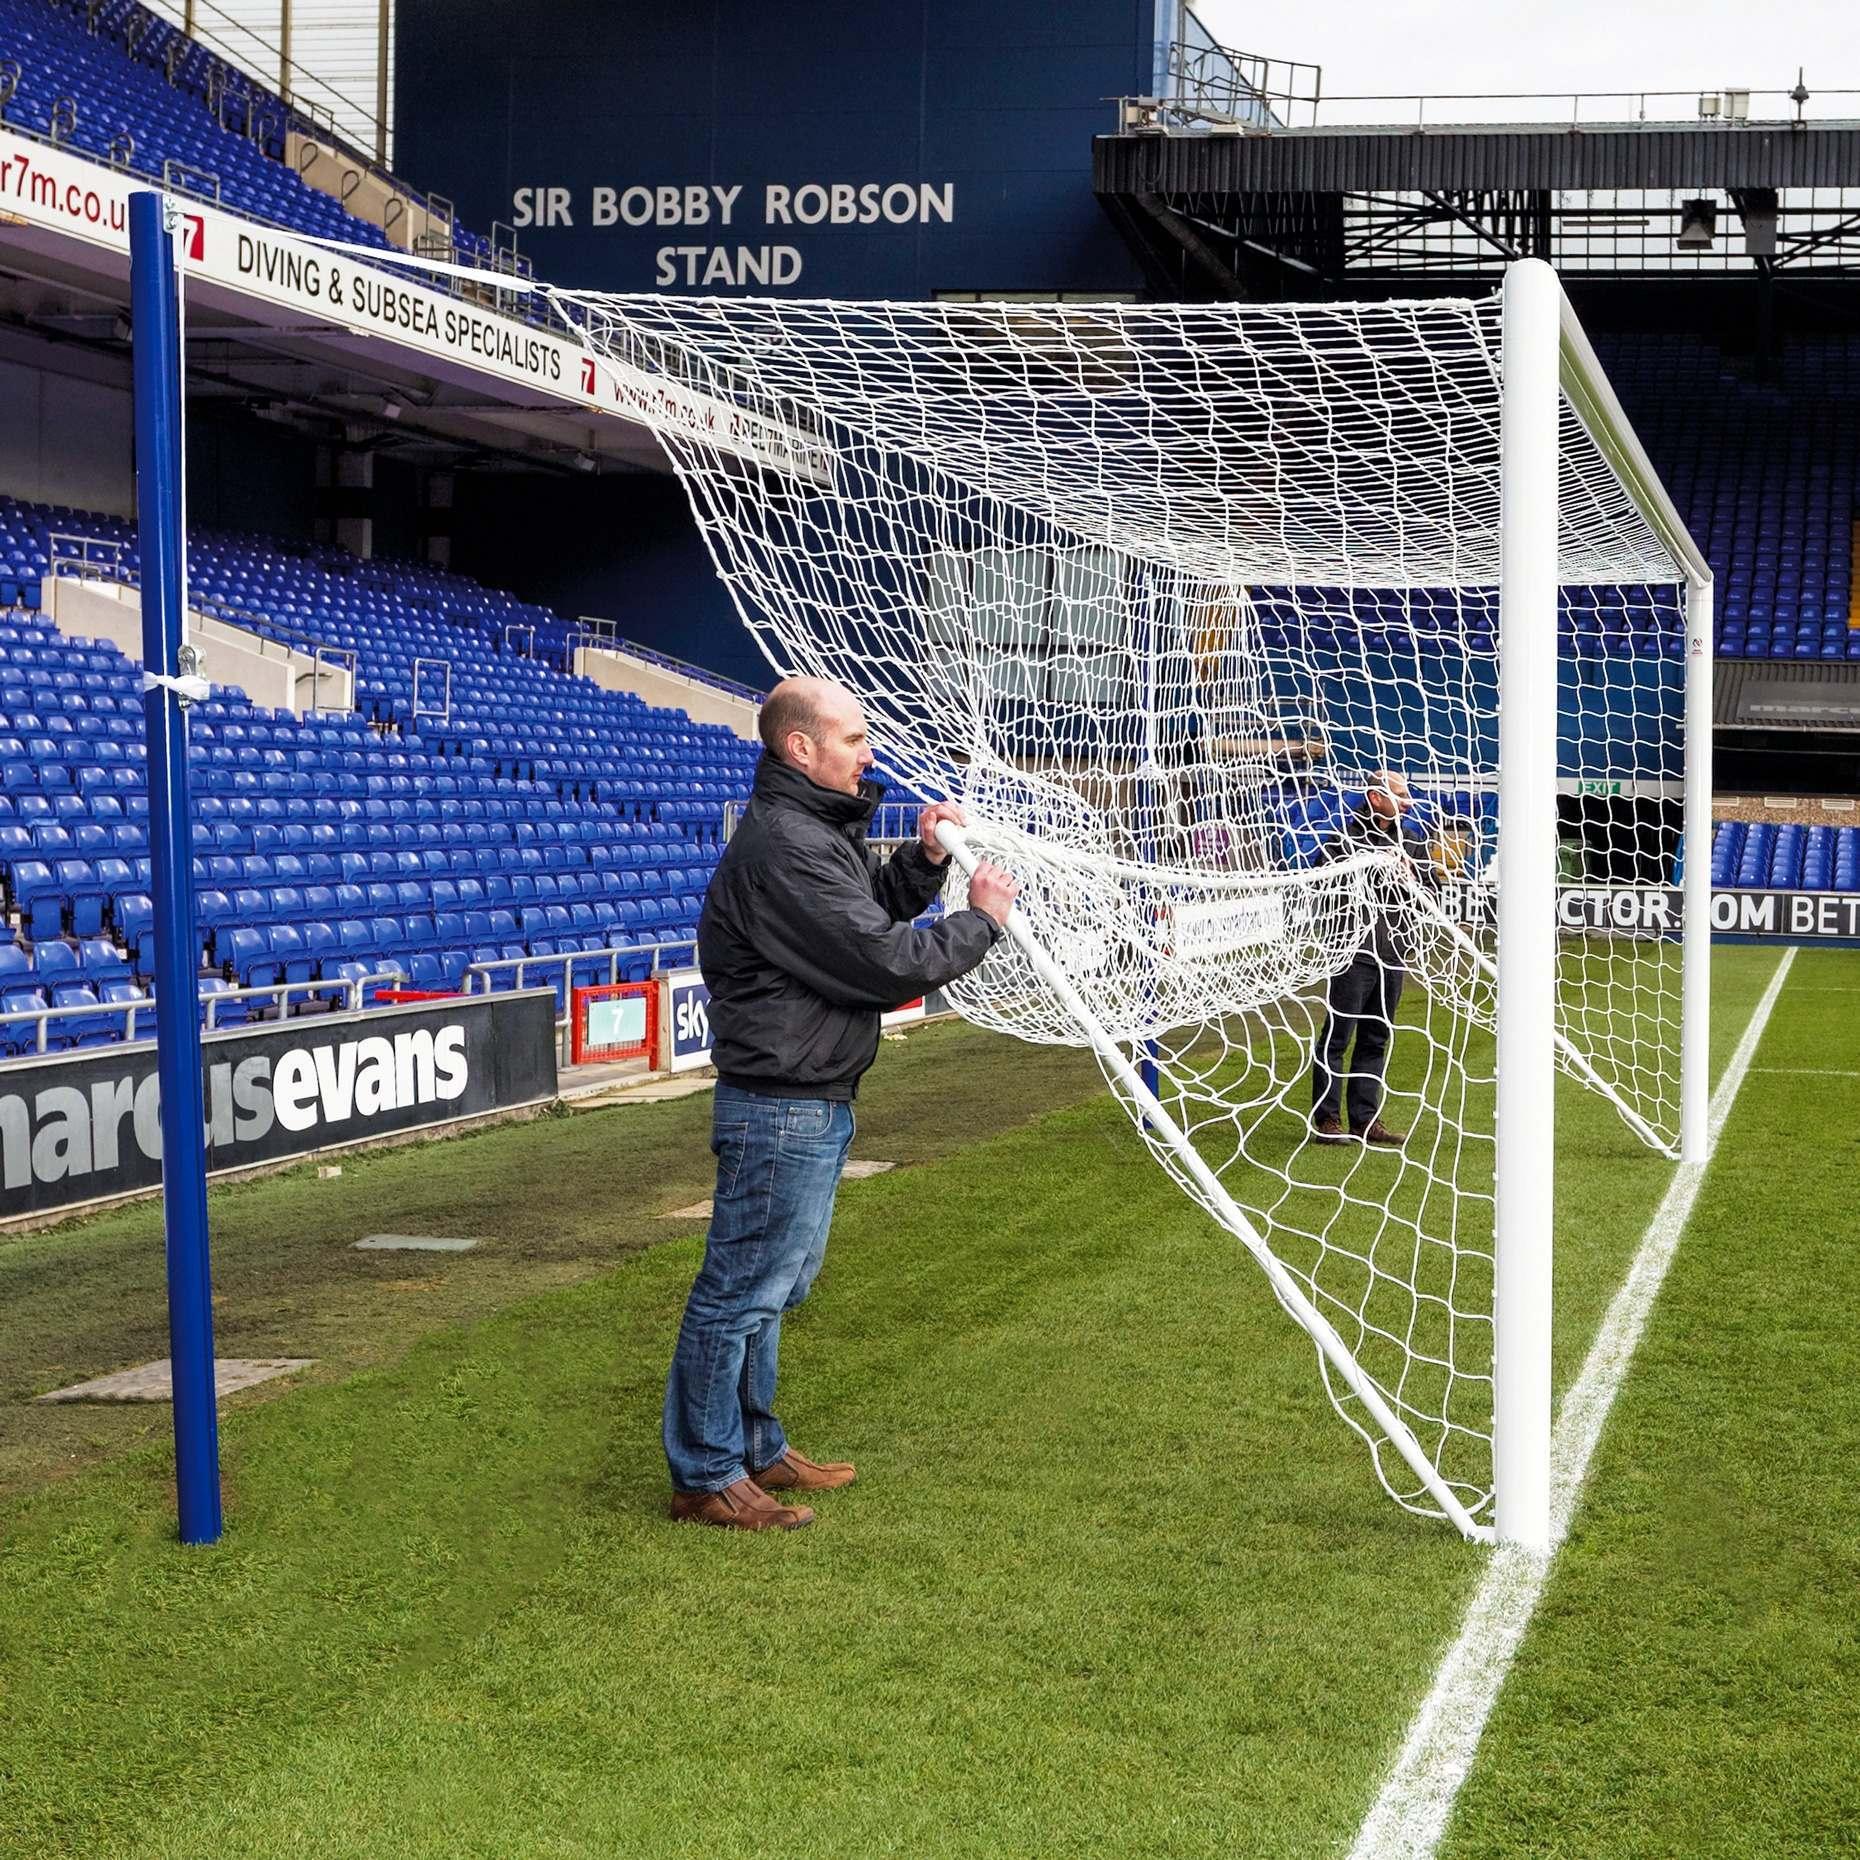 Stadium Goal Conversion Kit Stanchions Nets Net World